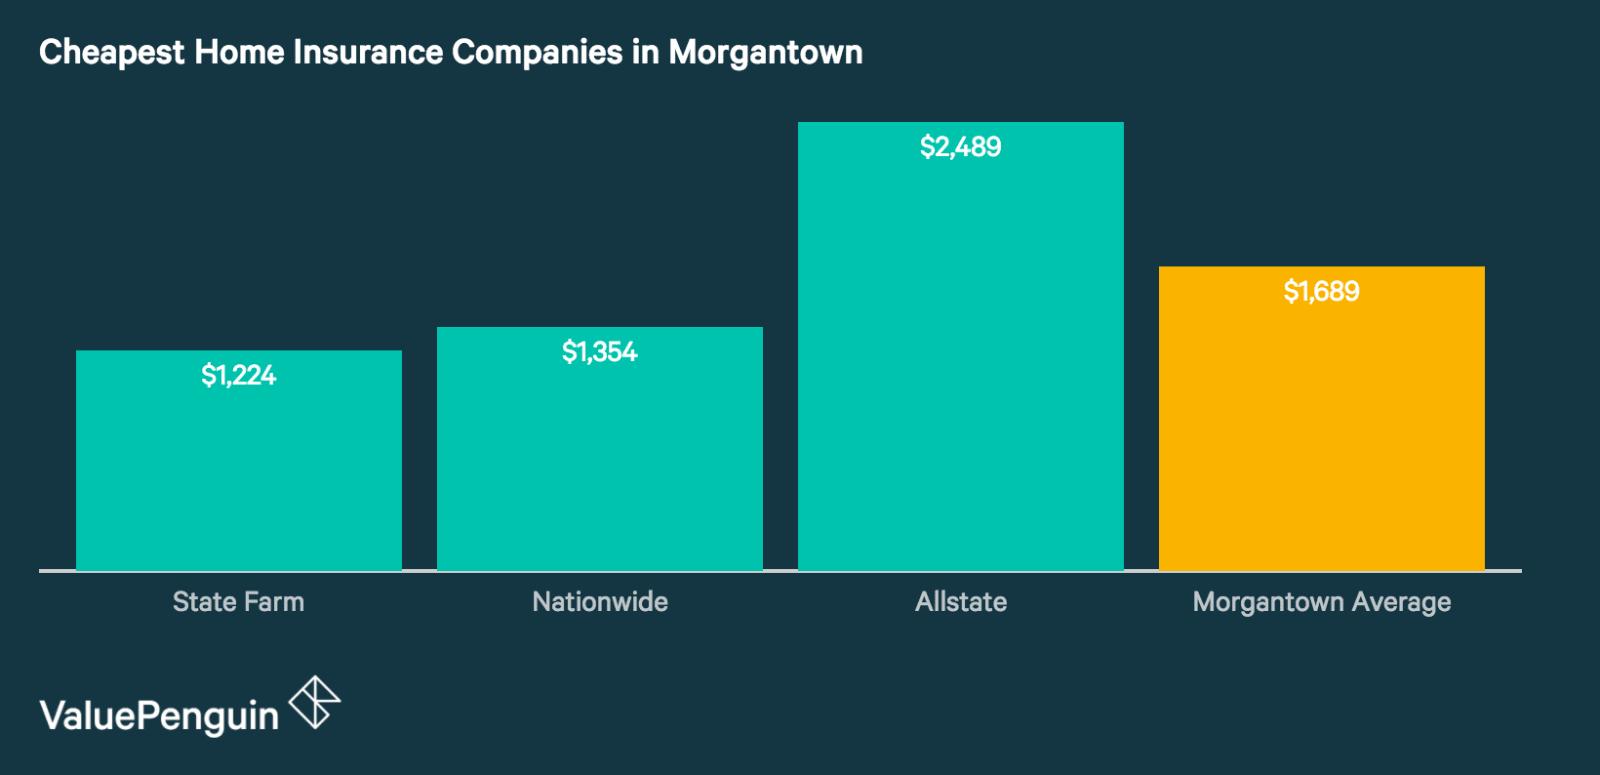 Morgantown's Best Home Insurance Companies